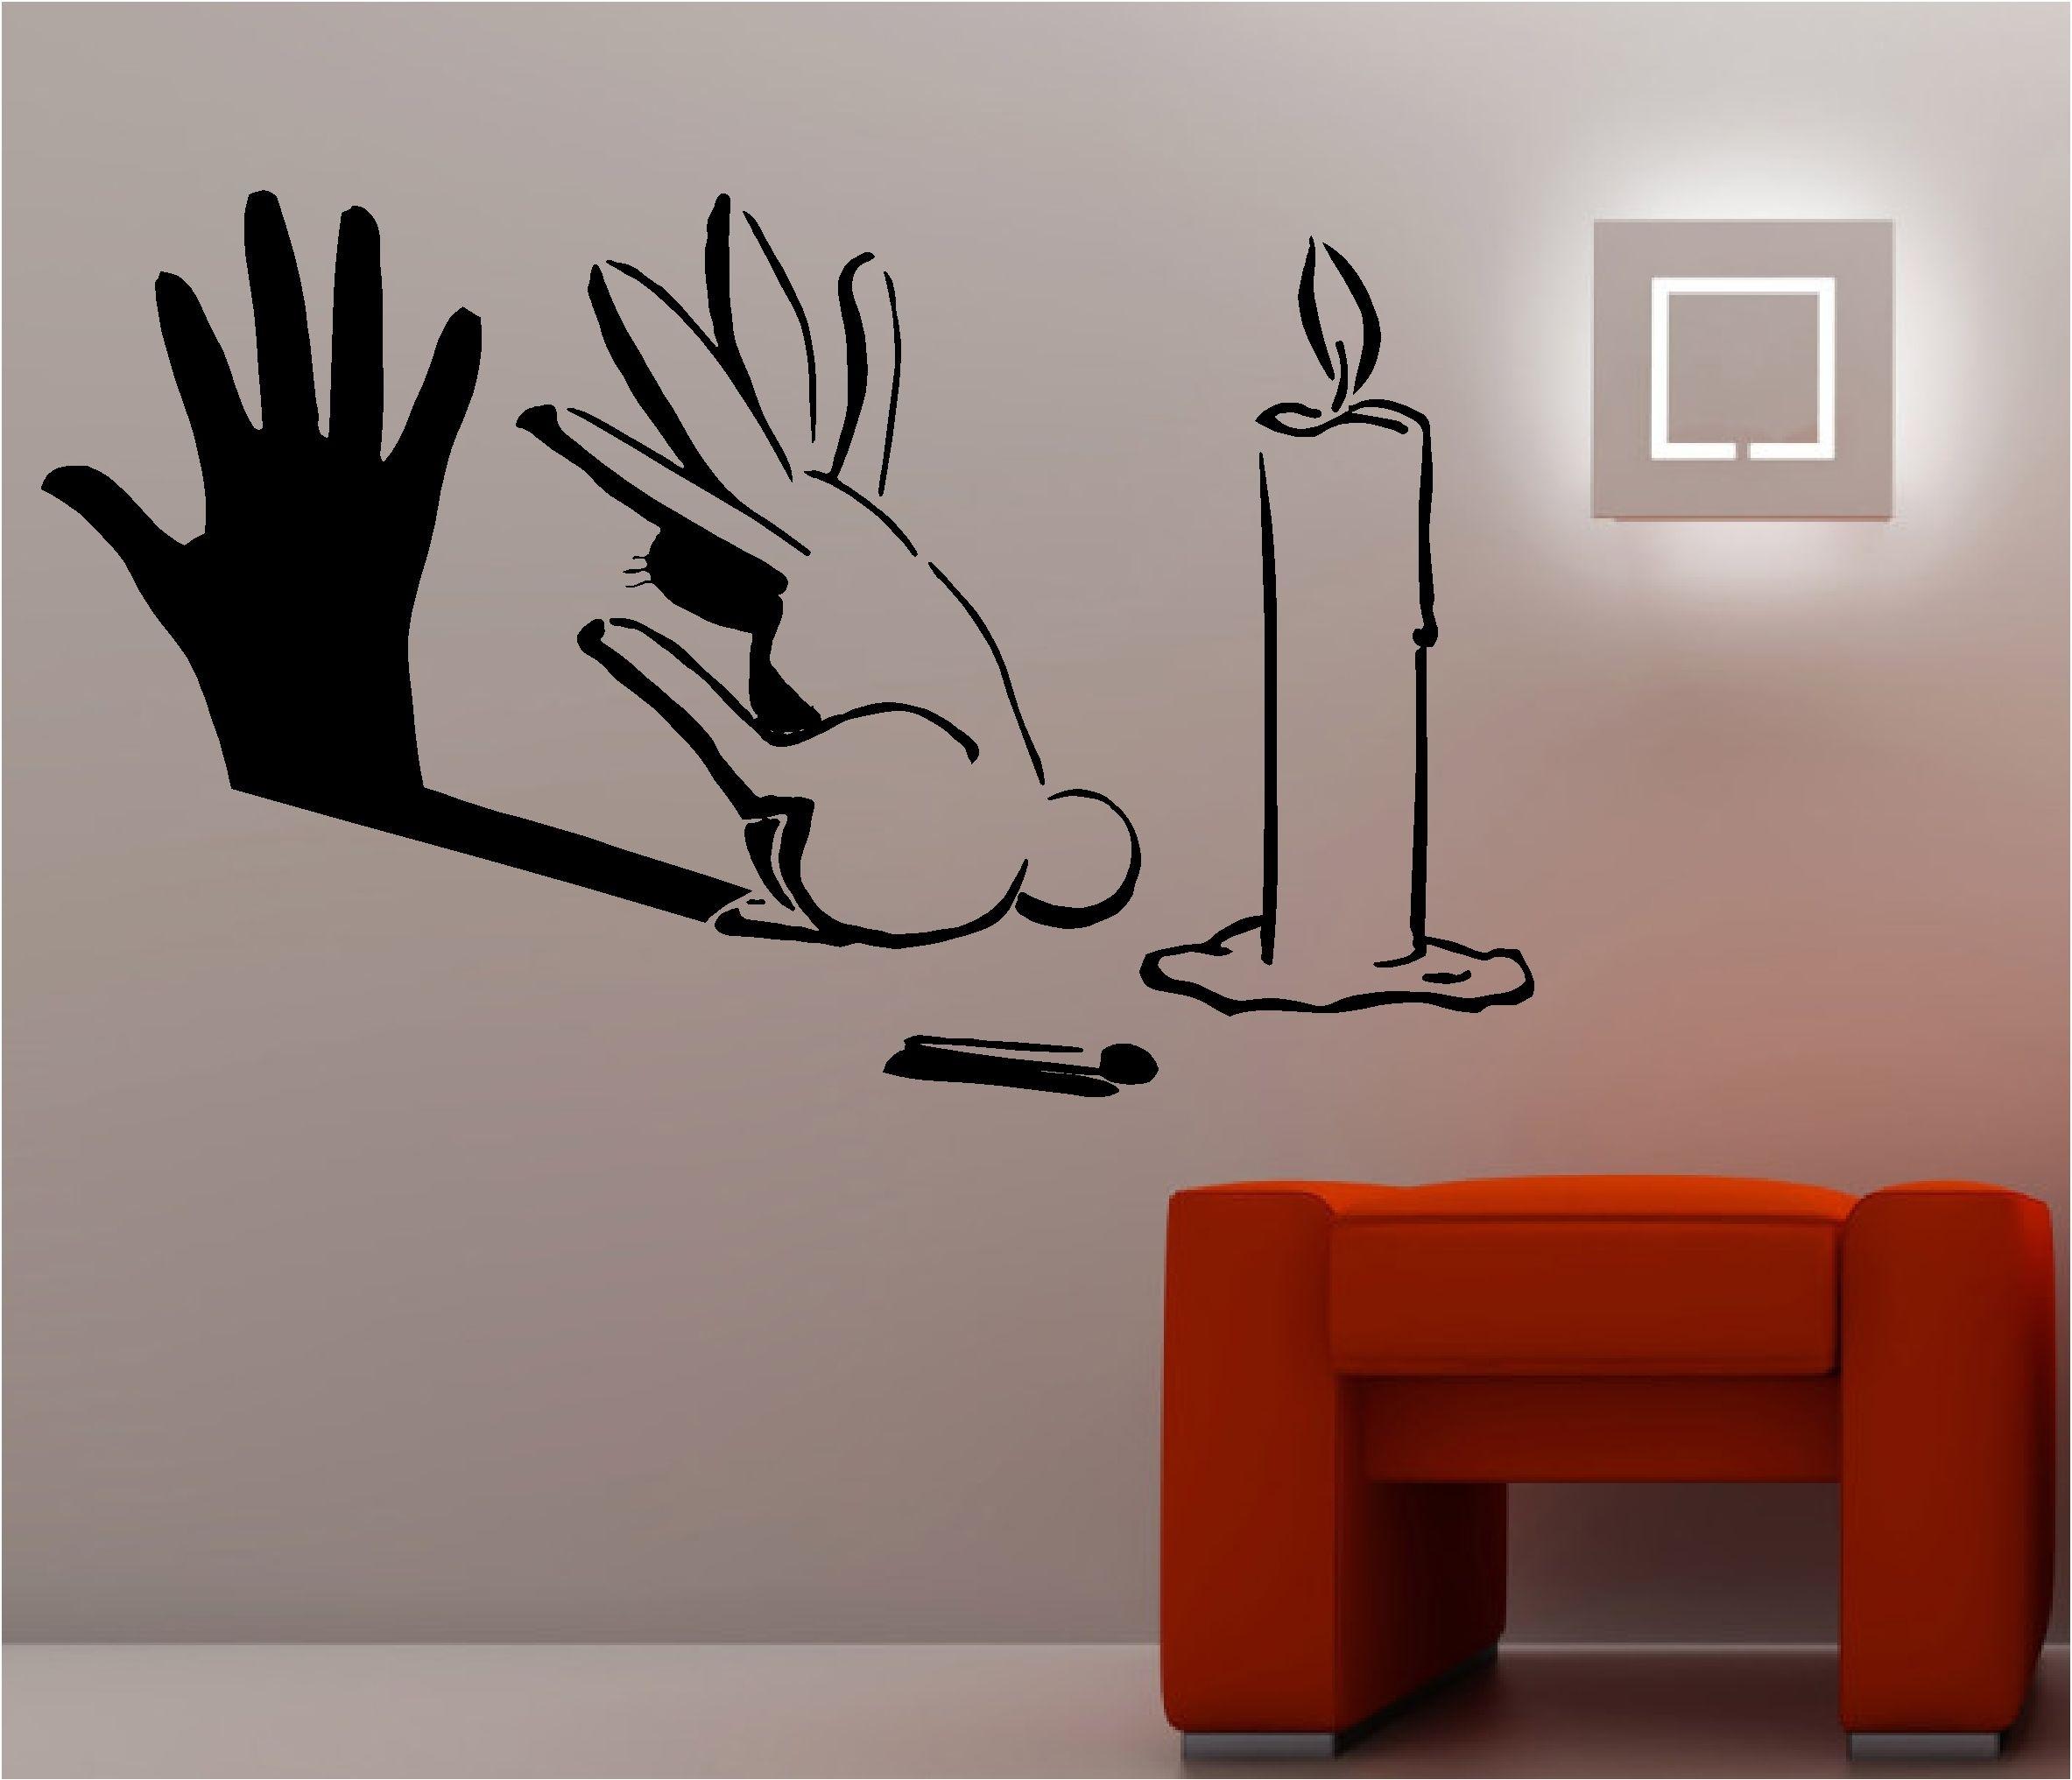 Wall Art Bedroom Home Design Plan, Typography Wall Art - Swinki Morskie for Home Decor Wall Art (Image 19 of 20)